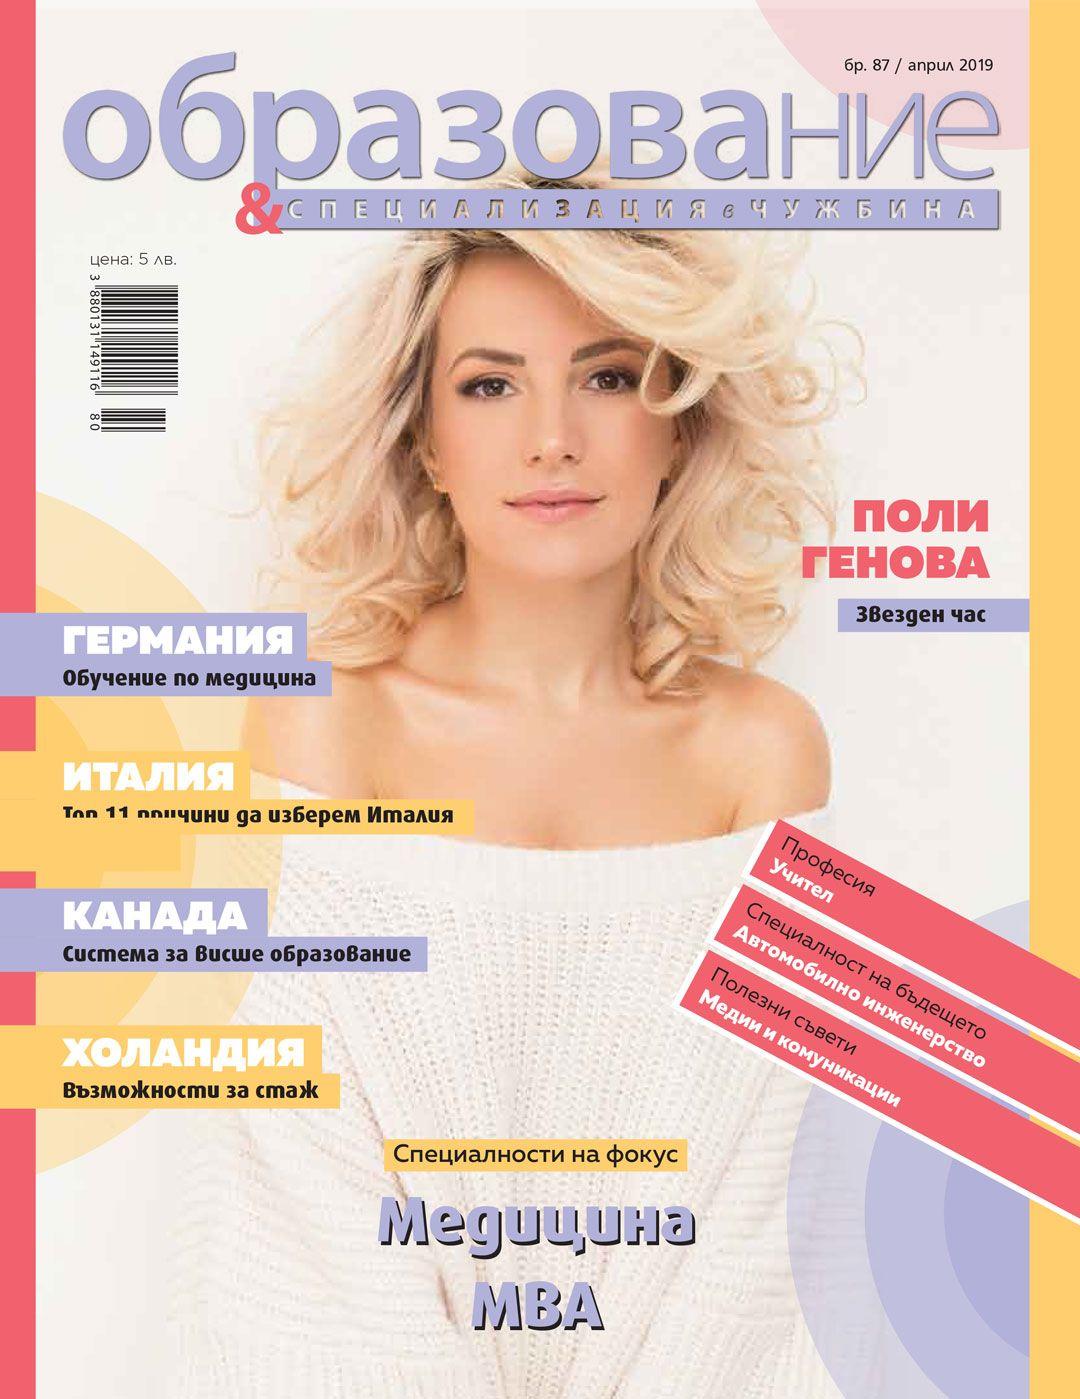 Образование и специализация в чужбина – брой 87 (Април 2019) - 1